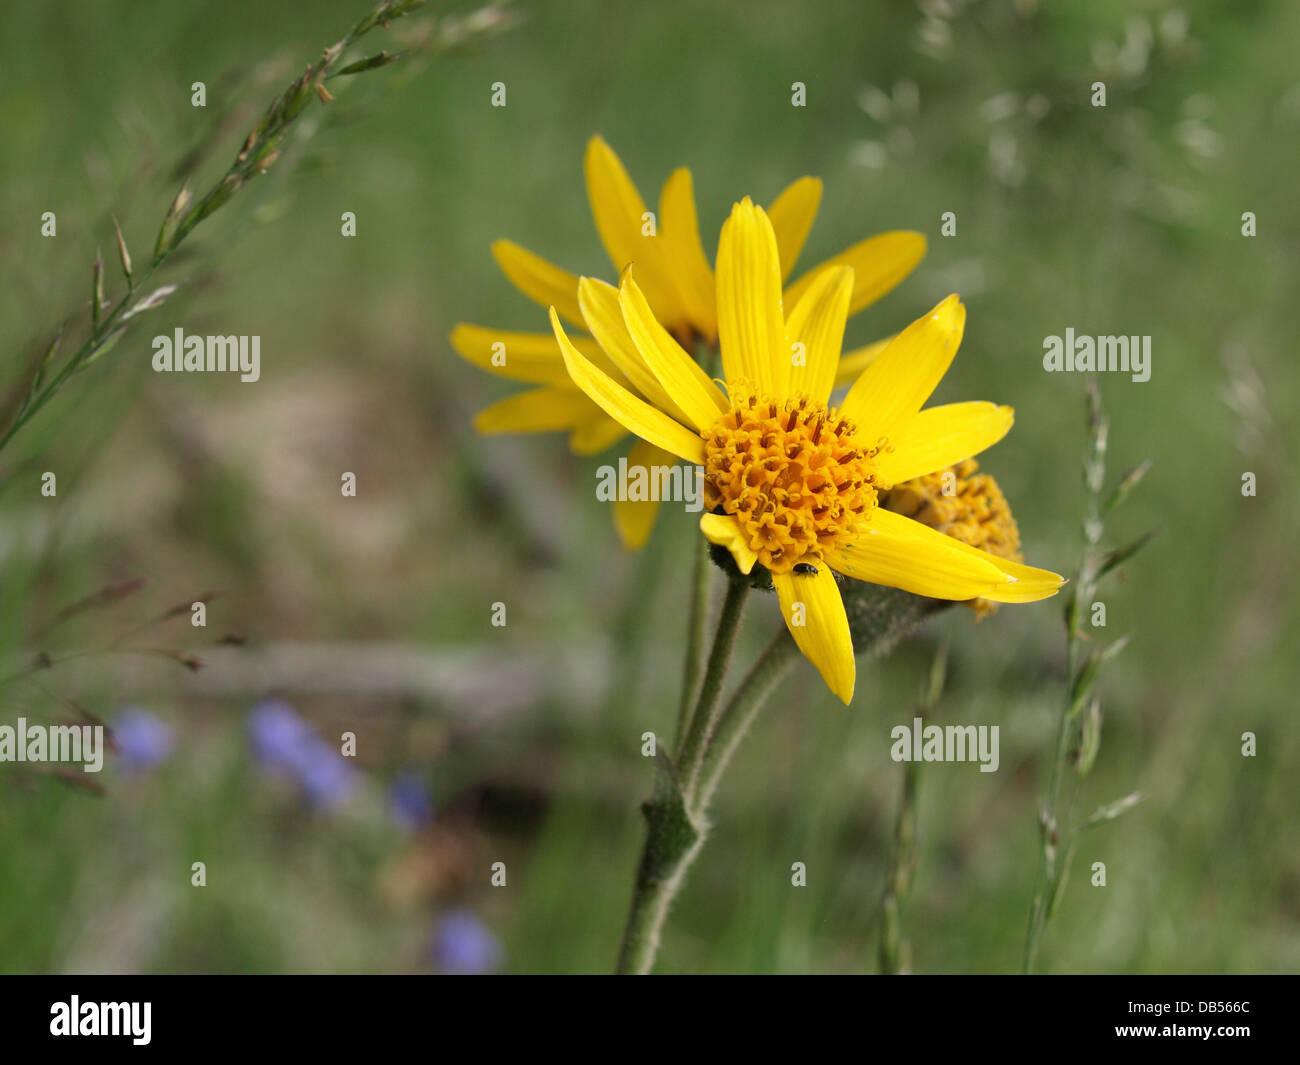 leopard´s bane, wolf´s bane, mountain tobacco, mountain arnica / Arnica montana / Echte Arnika Stock Photo